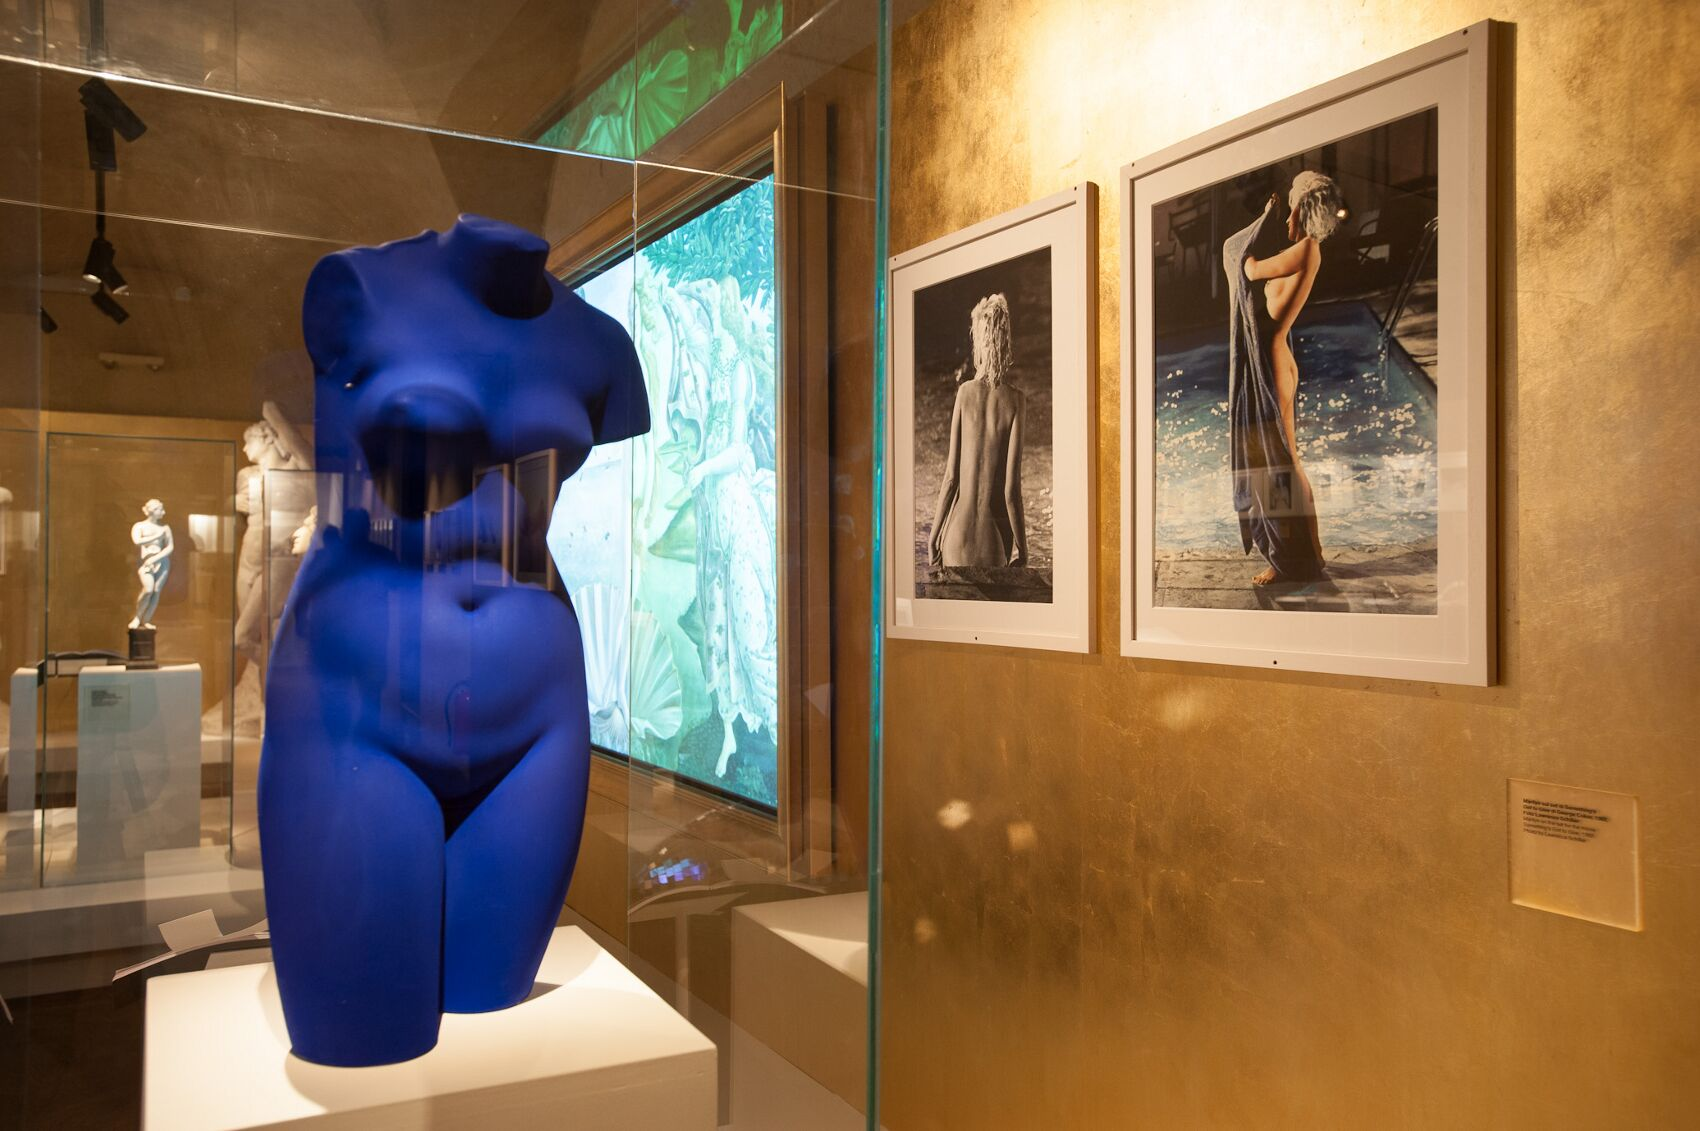 Salvatore Ferragamo Exhibition dedicated to Marilyn Monroe Salvatore Ferragamo Museum Woman Statue